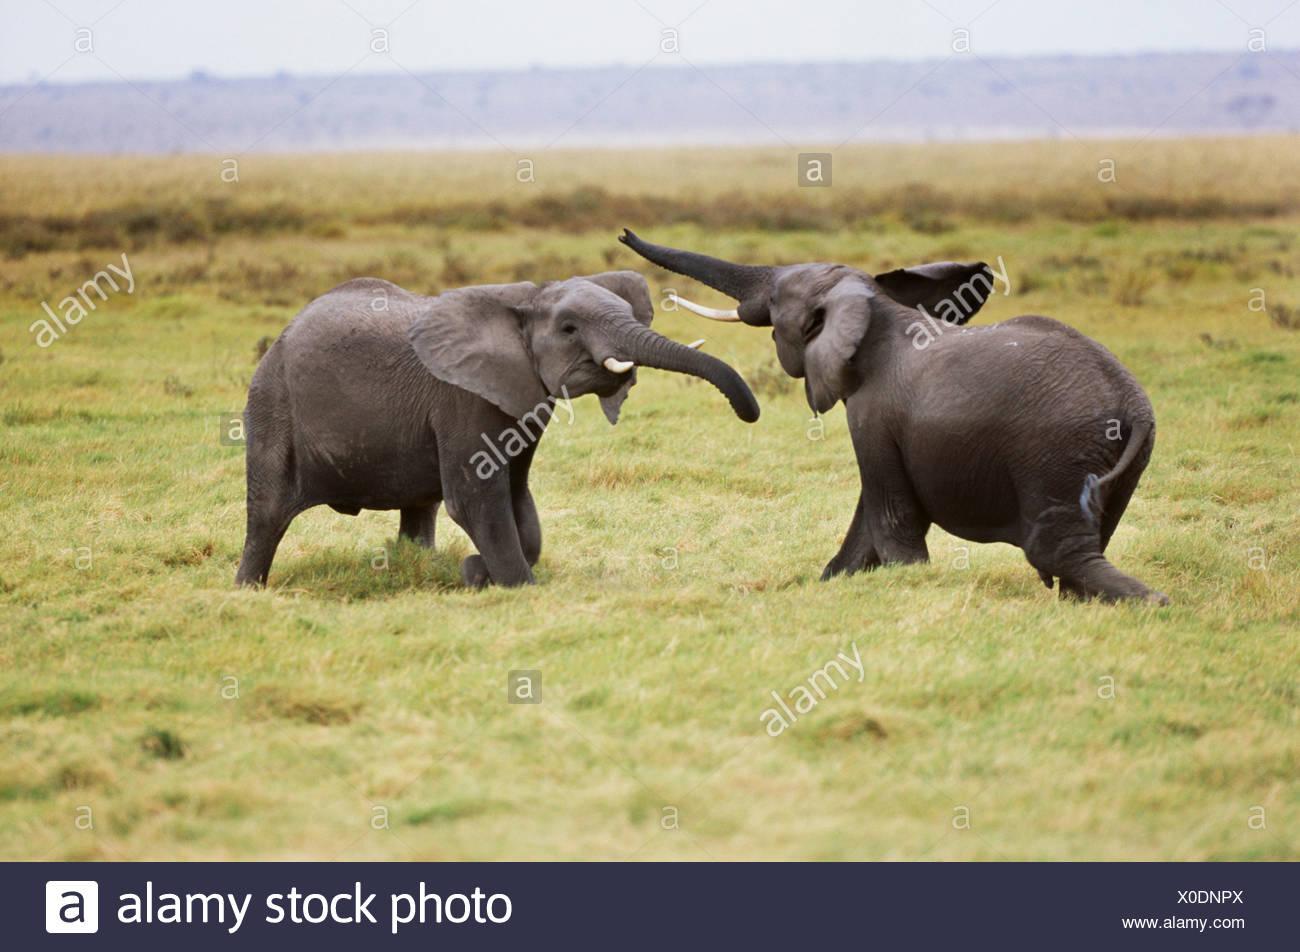 African elephants sparring, Amboseli National Park, Kenya - Stock Image